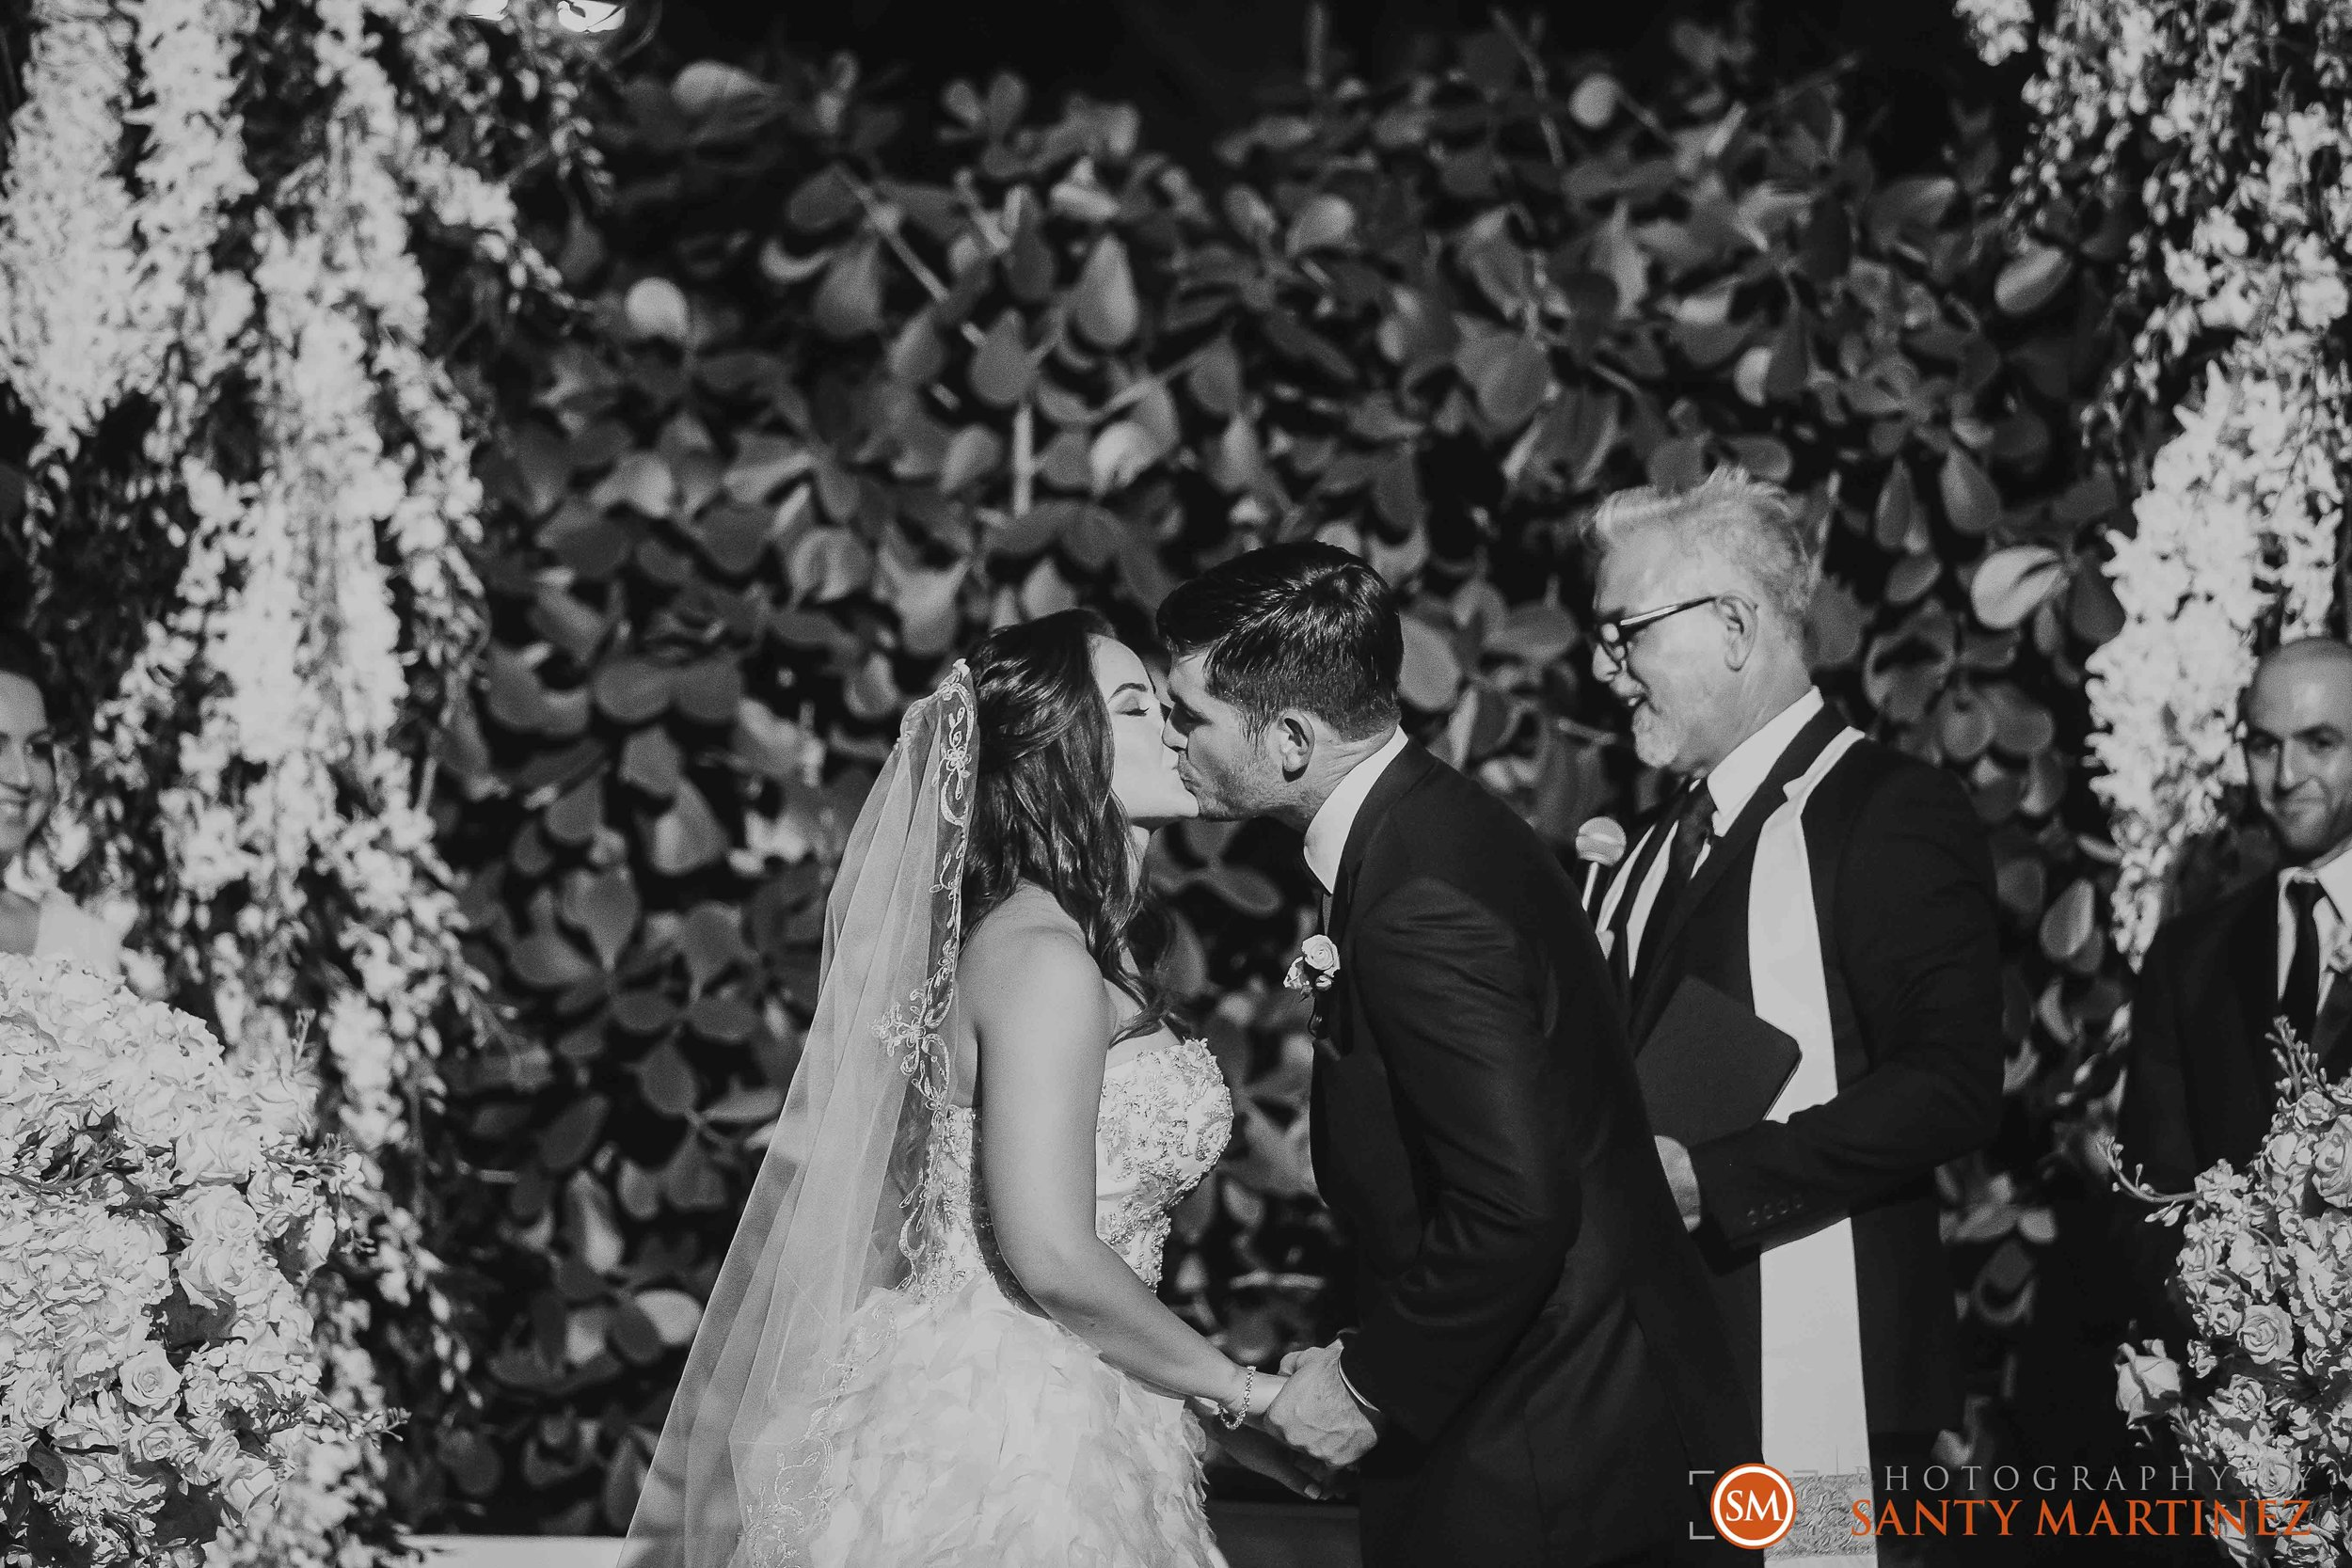 Wedding Coral Gables Country Club - Santy Martinez Photography-28.jpg